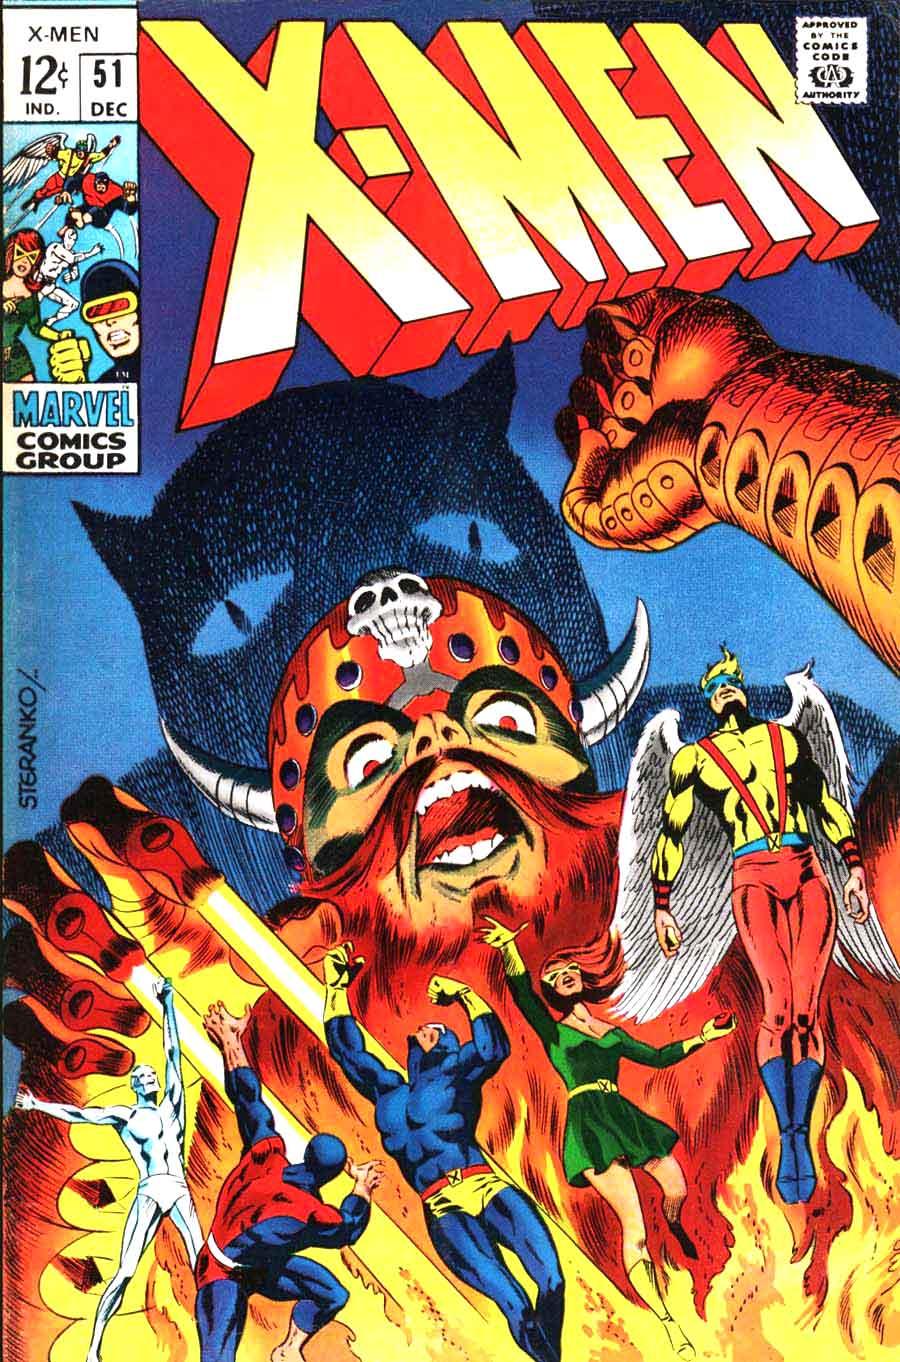 Marvel Comic Book Cover Art : X men jim steranko art cover pencil ink